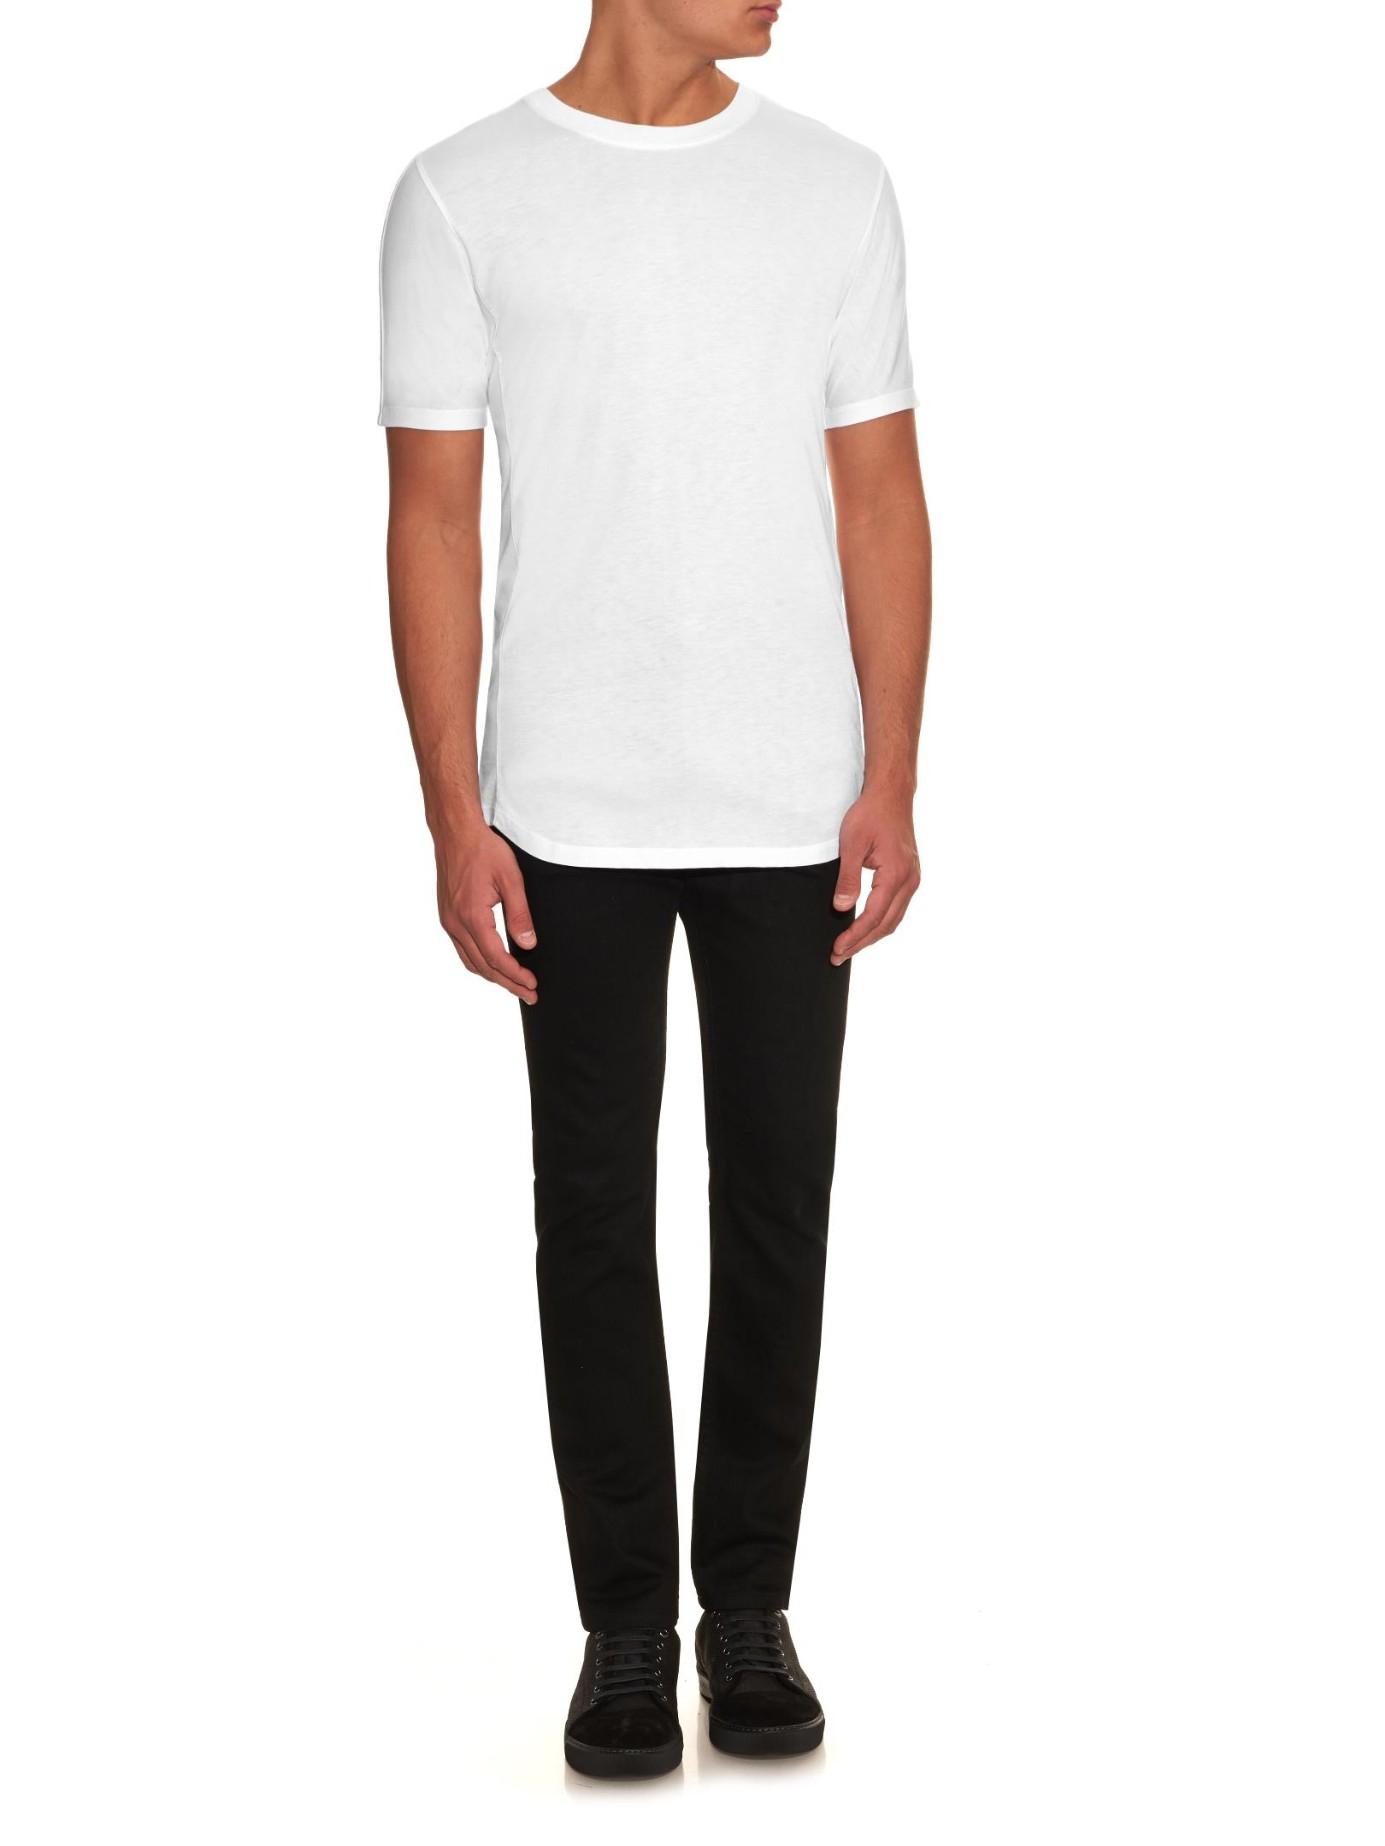 helmut lang crew neck jersey t shirt in white for men lyst. Black Bedroom Furniture Sets. Home Design Ideas